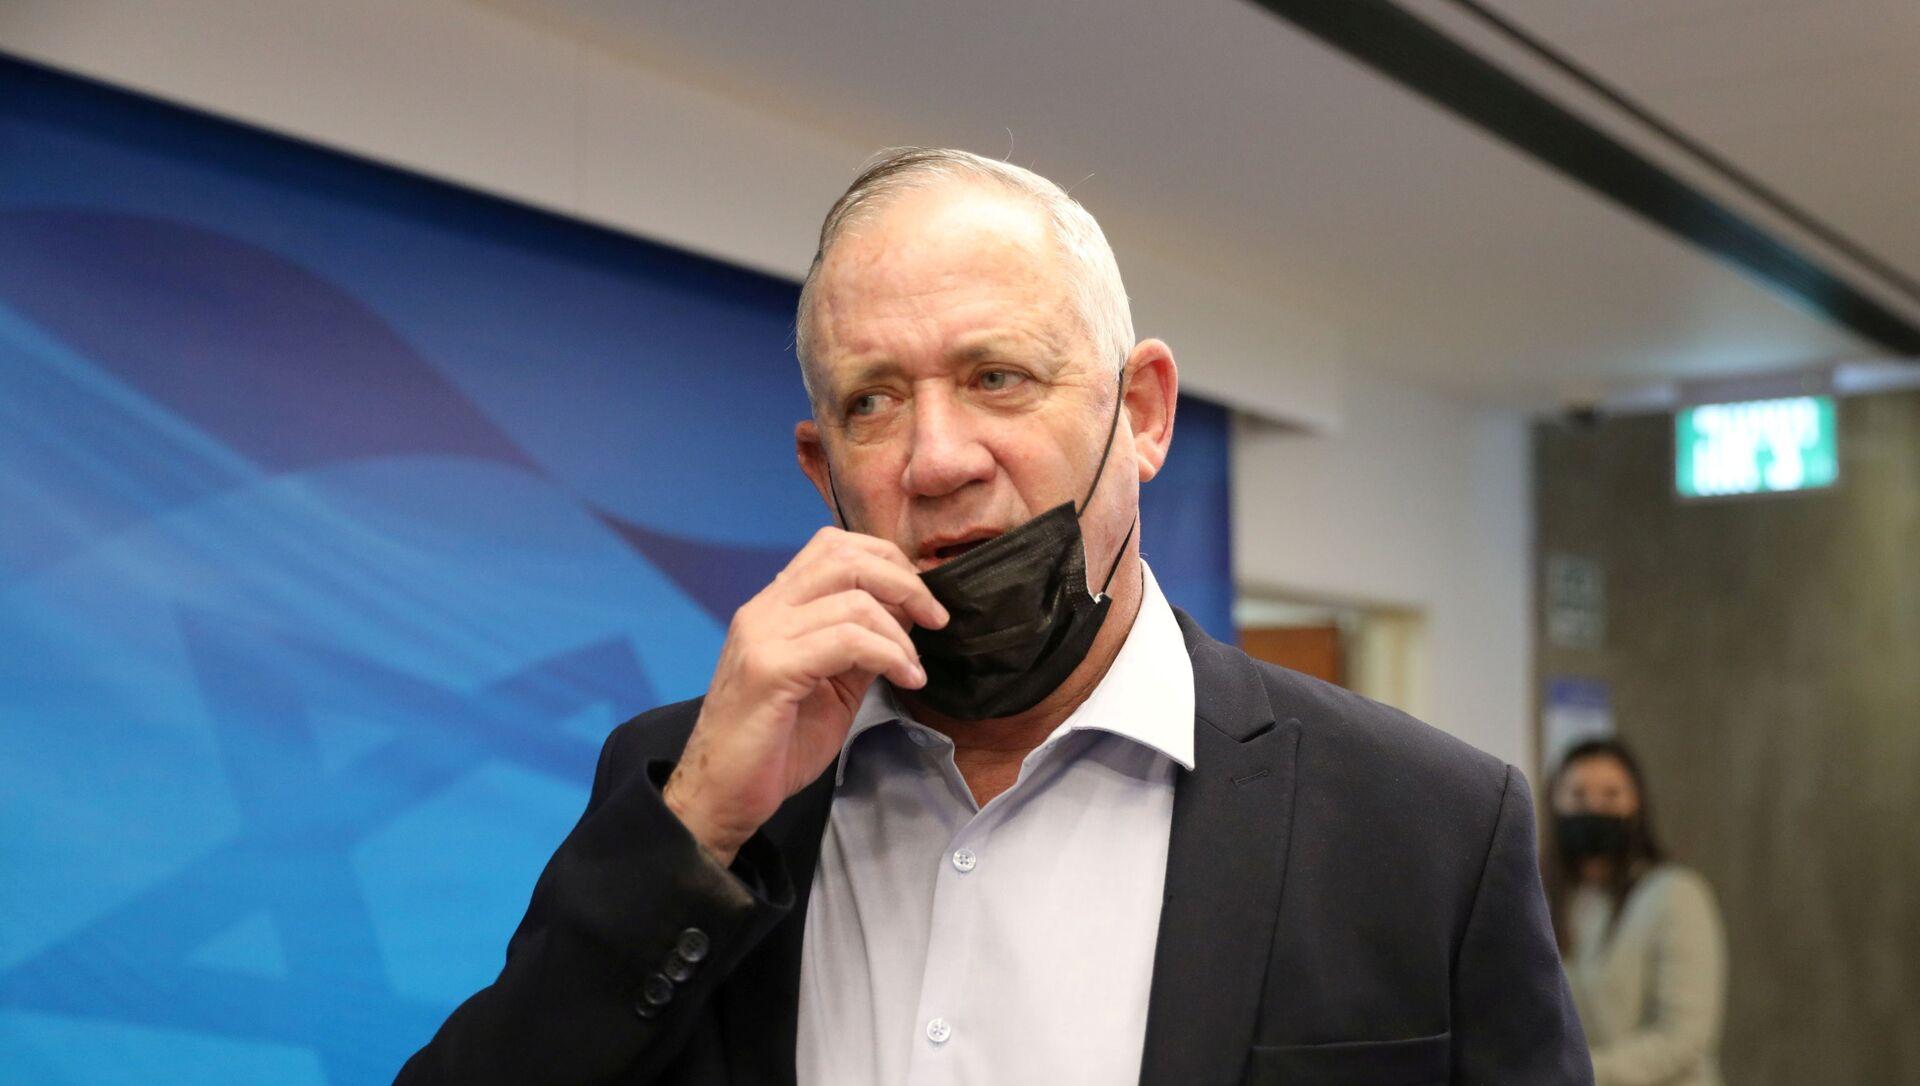 Israeli Defense Minister Benny Gantz adjusts his mask during the weekly cabinet meeting at the prime minister's office in Jerusalem August 1, 2021. - Sputnik International, 1920, 02.08.2021